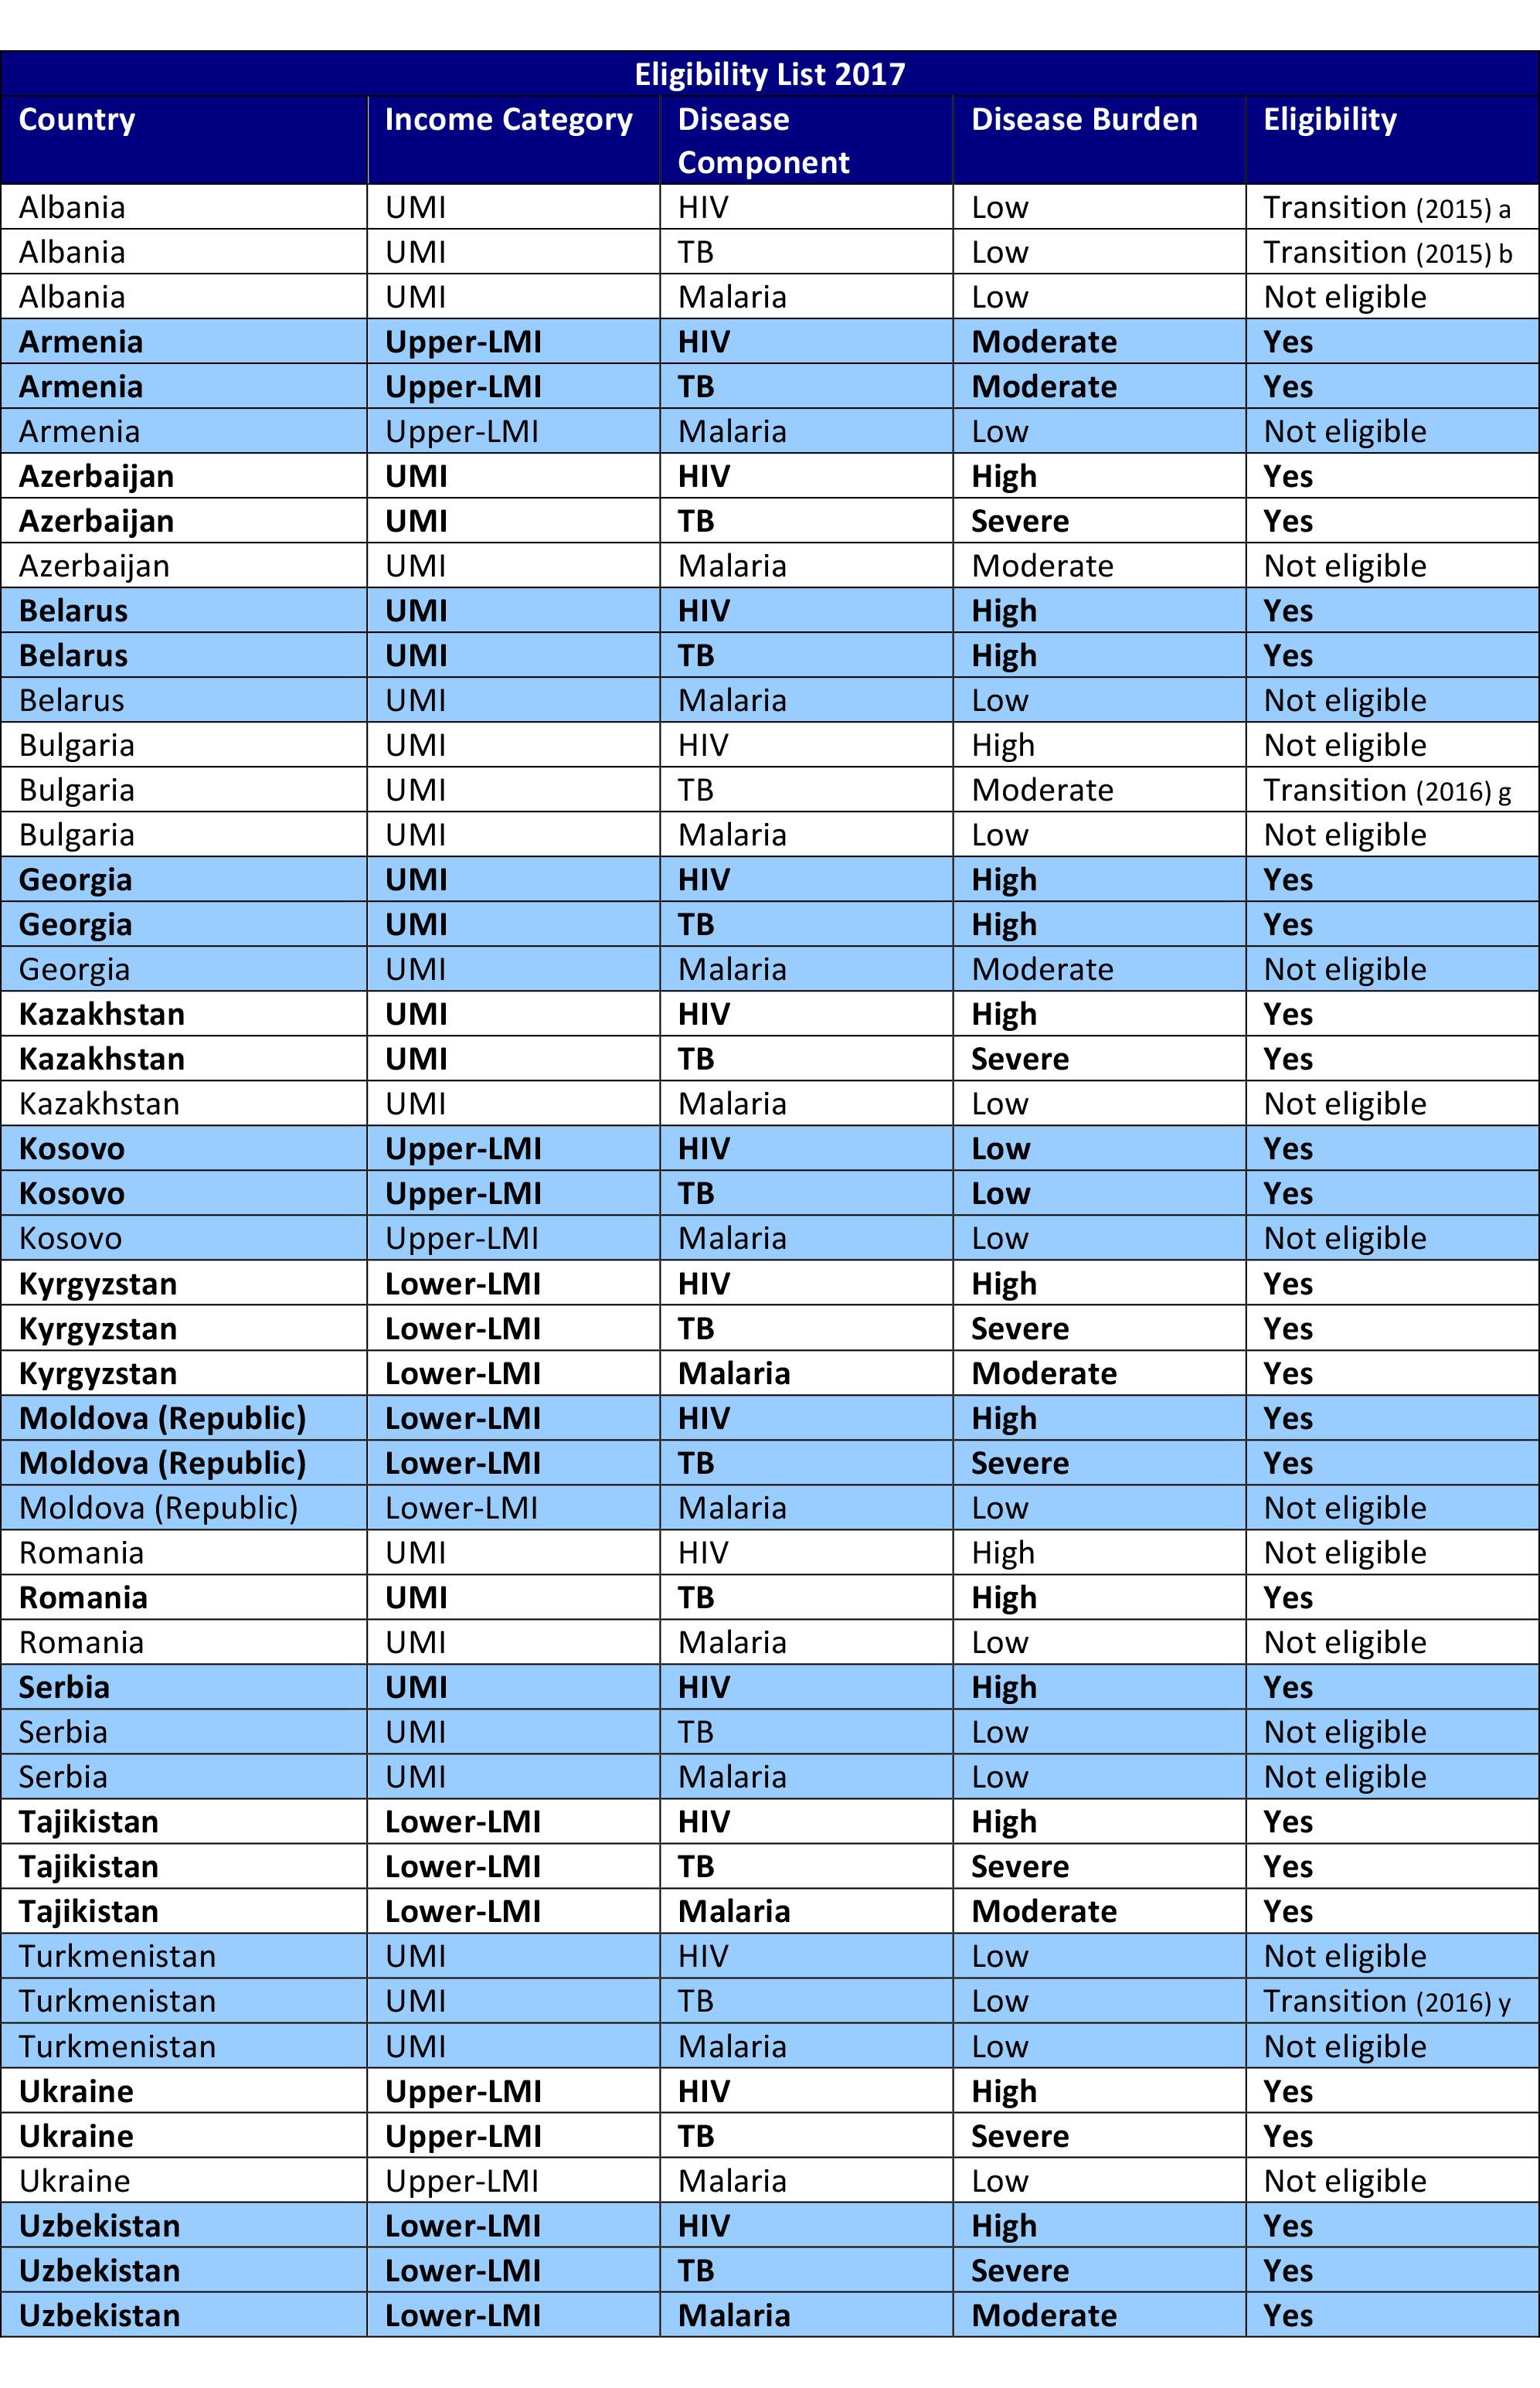 Microsoft Word - Eligibility List 2017.docx